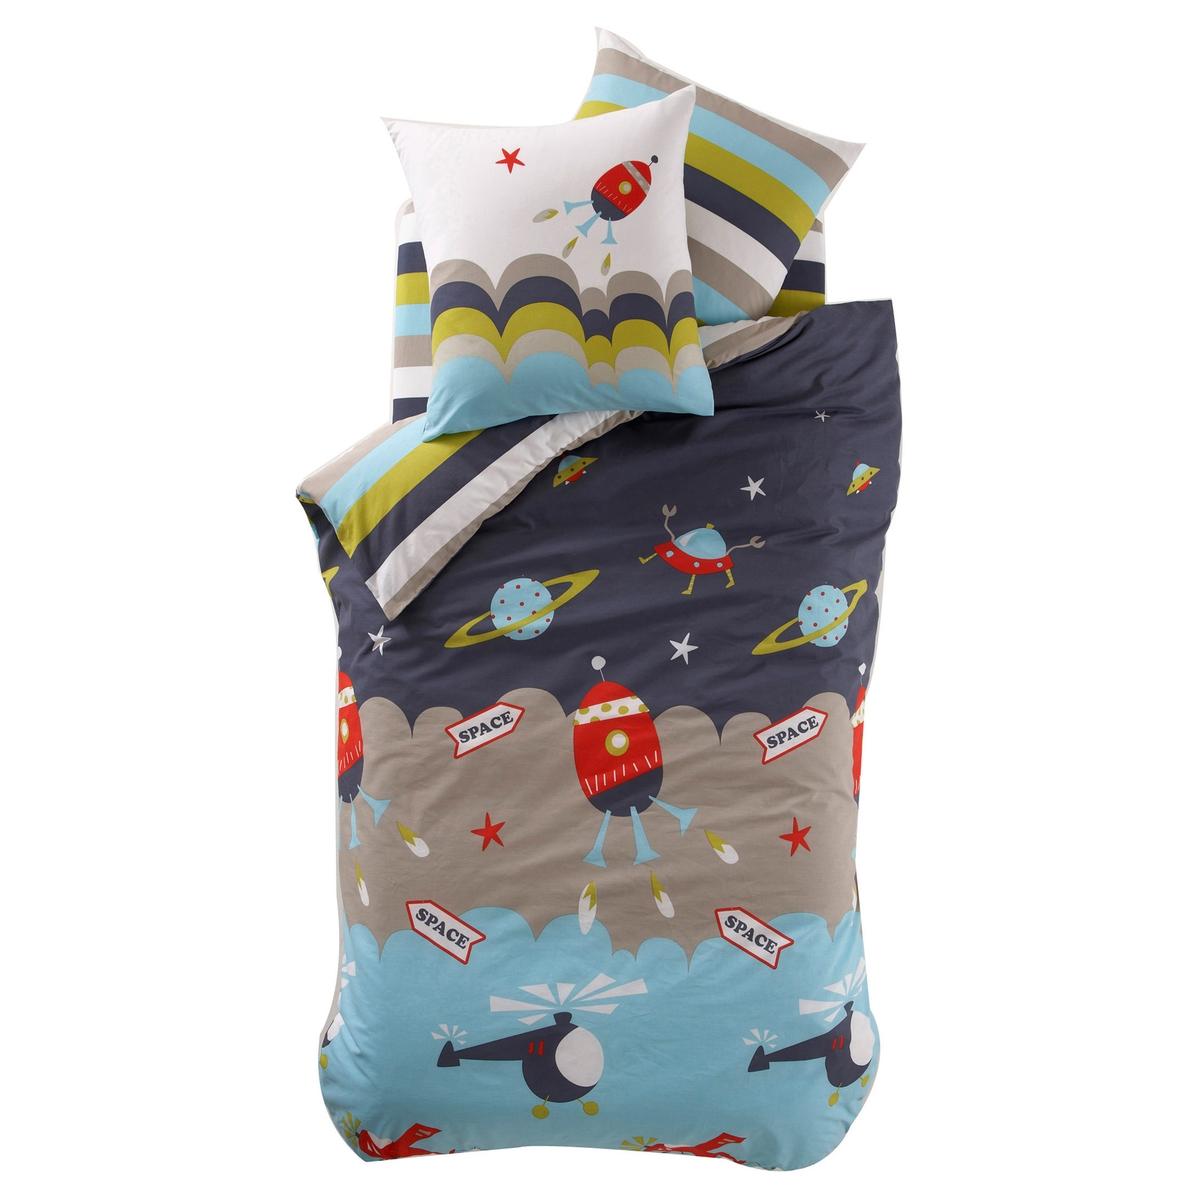 Kinder-Bettbezug ALAN | Kinderzimmer > Kinderbetten | Blau | Baumwolle | La Redoute Interieurs